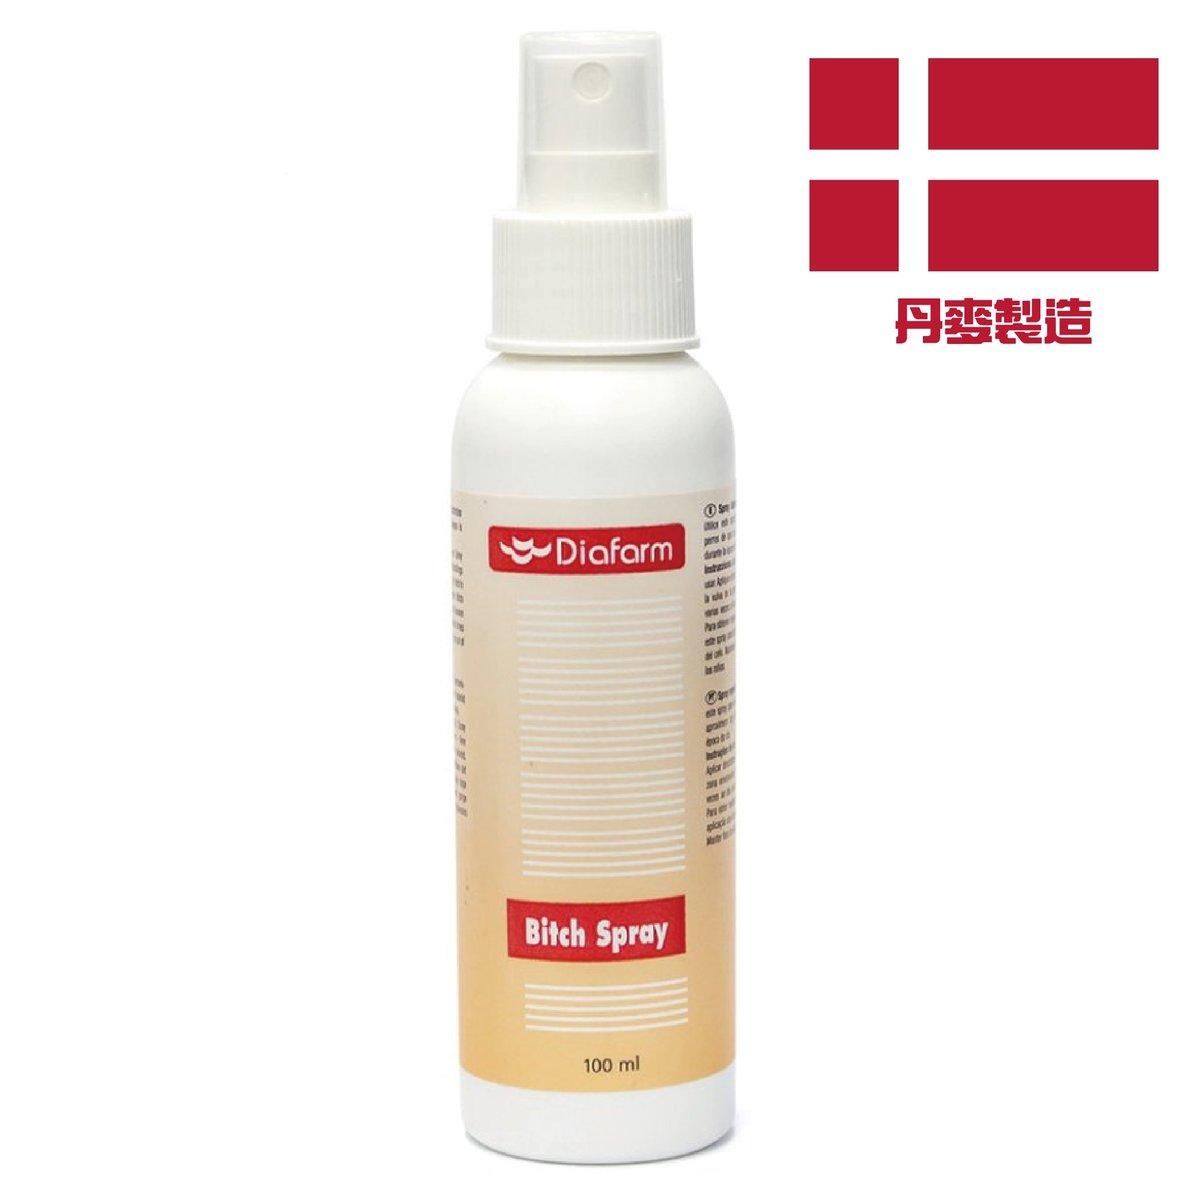 Bitch Spray (ST-16502), made in Denmark